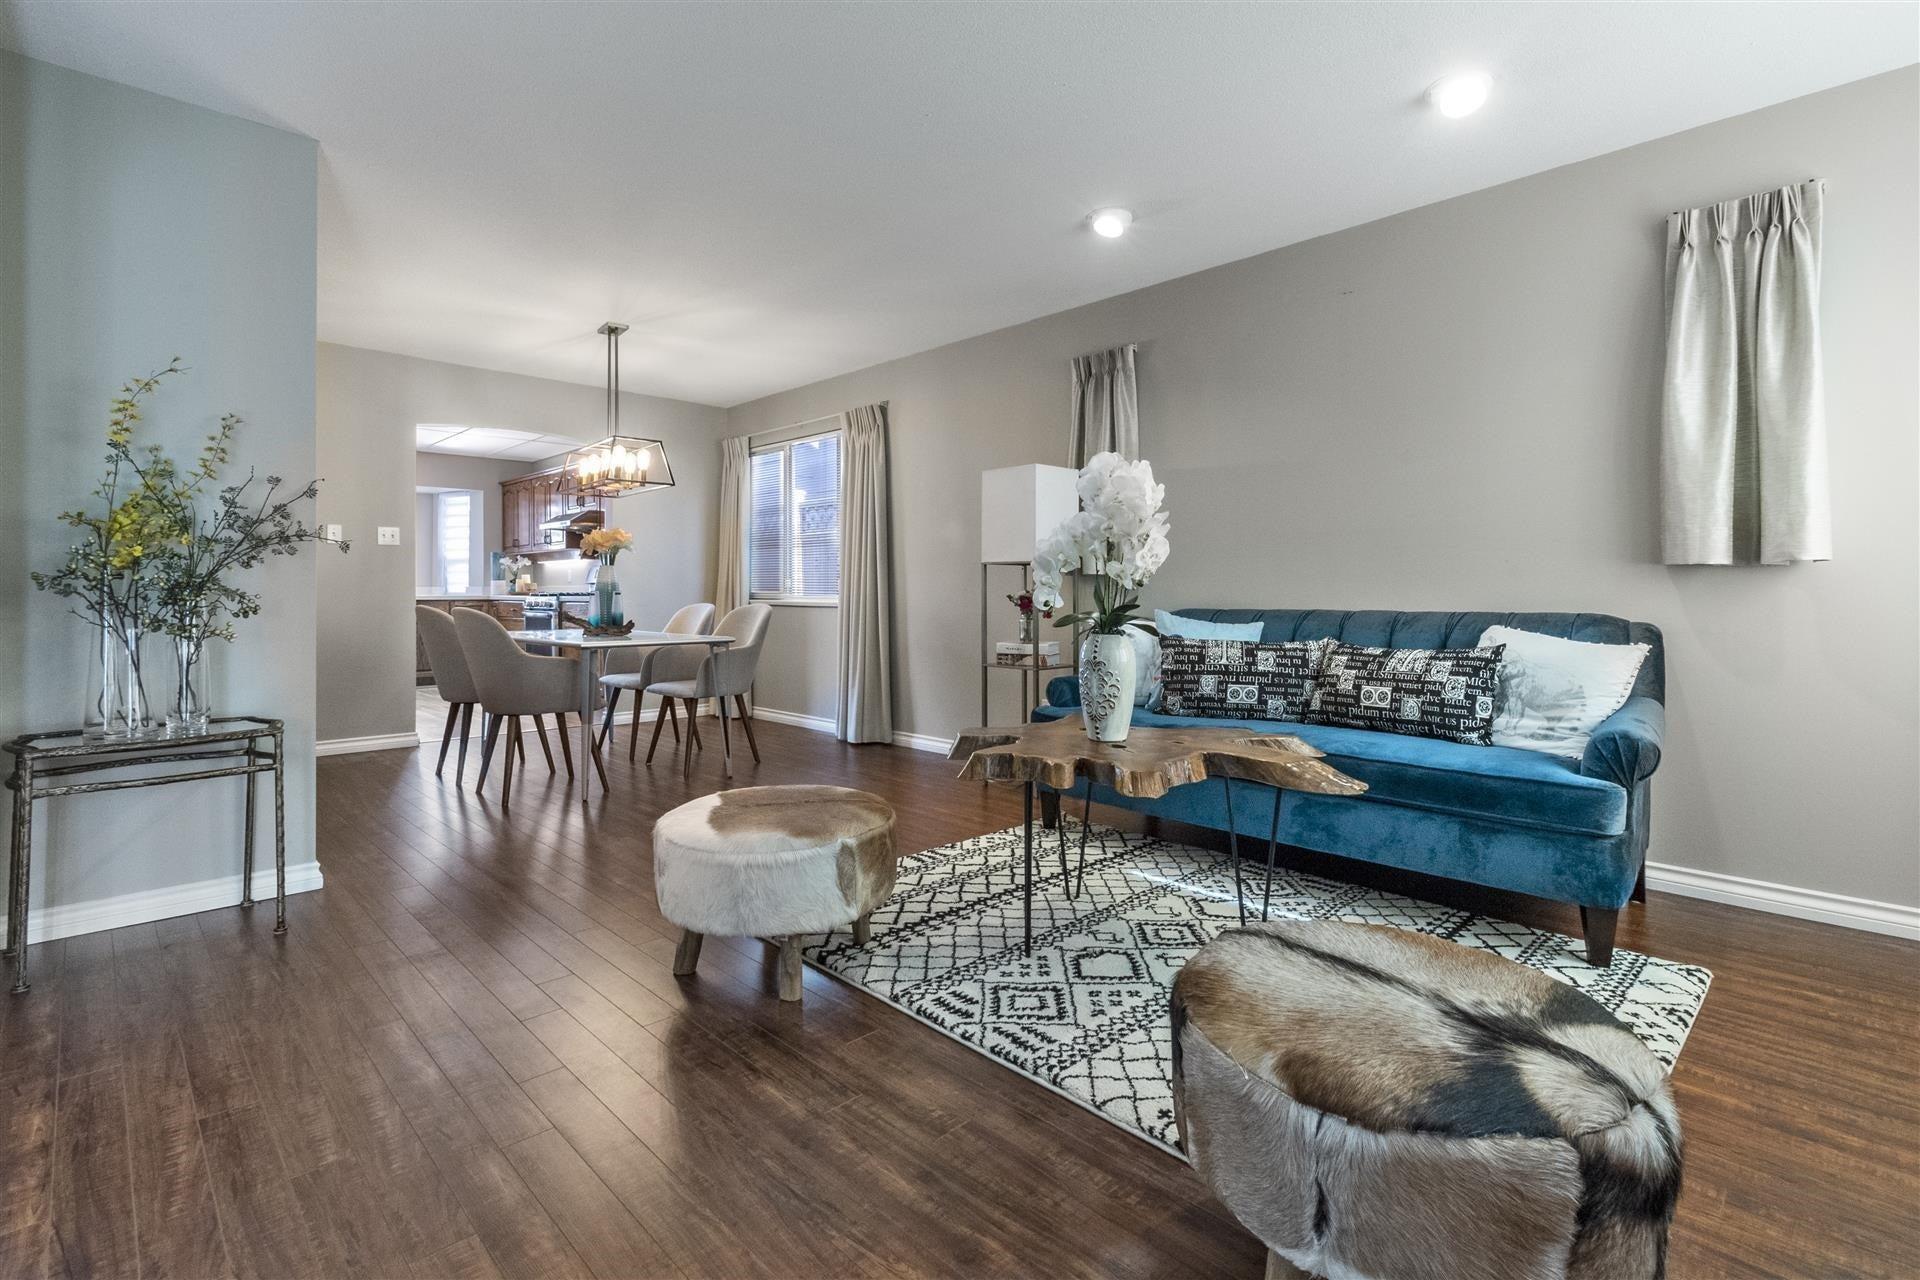 3631 GEORGIA STREET - Steveston Village House/Single Family for sale, 3 Bedrooms (R2623894) - #3